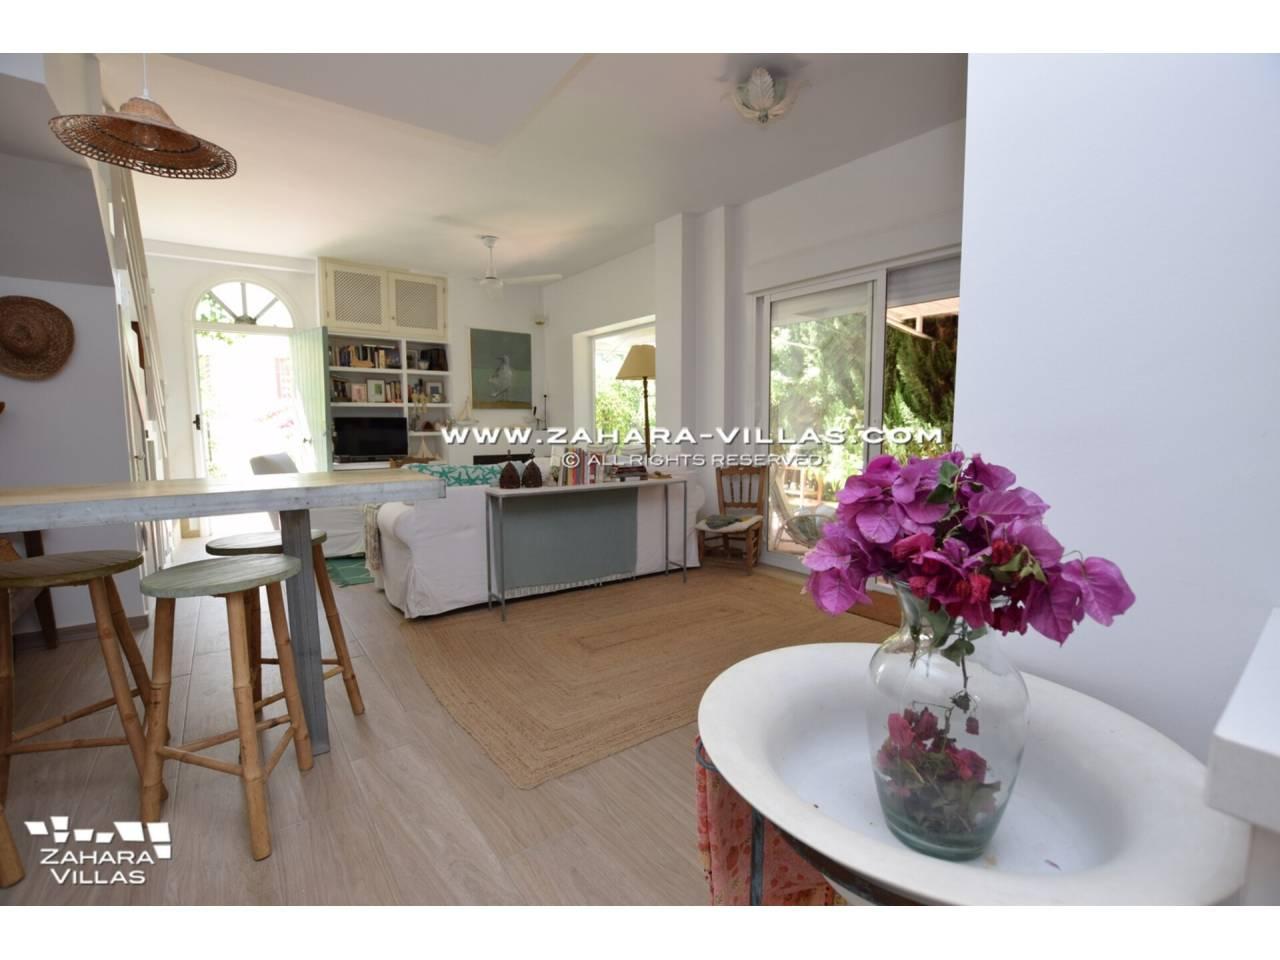 Imagen 8 de House for sale close to the beach, with sea views in Zahara de los Atunes